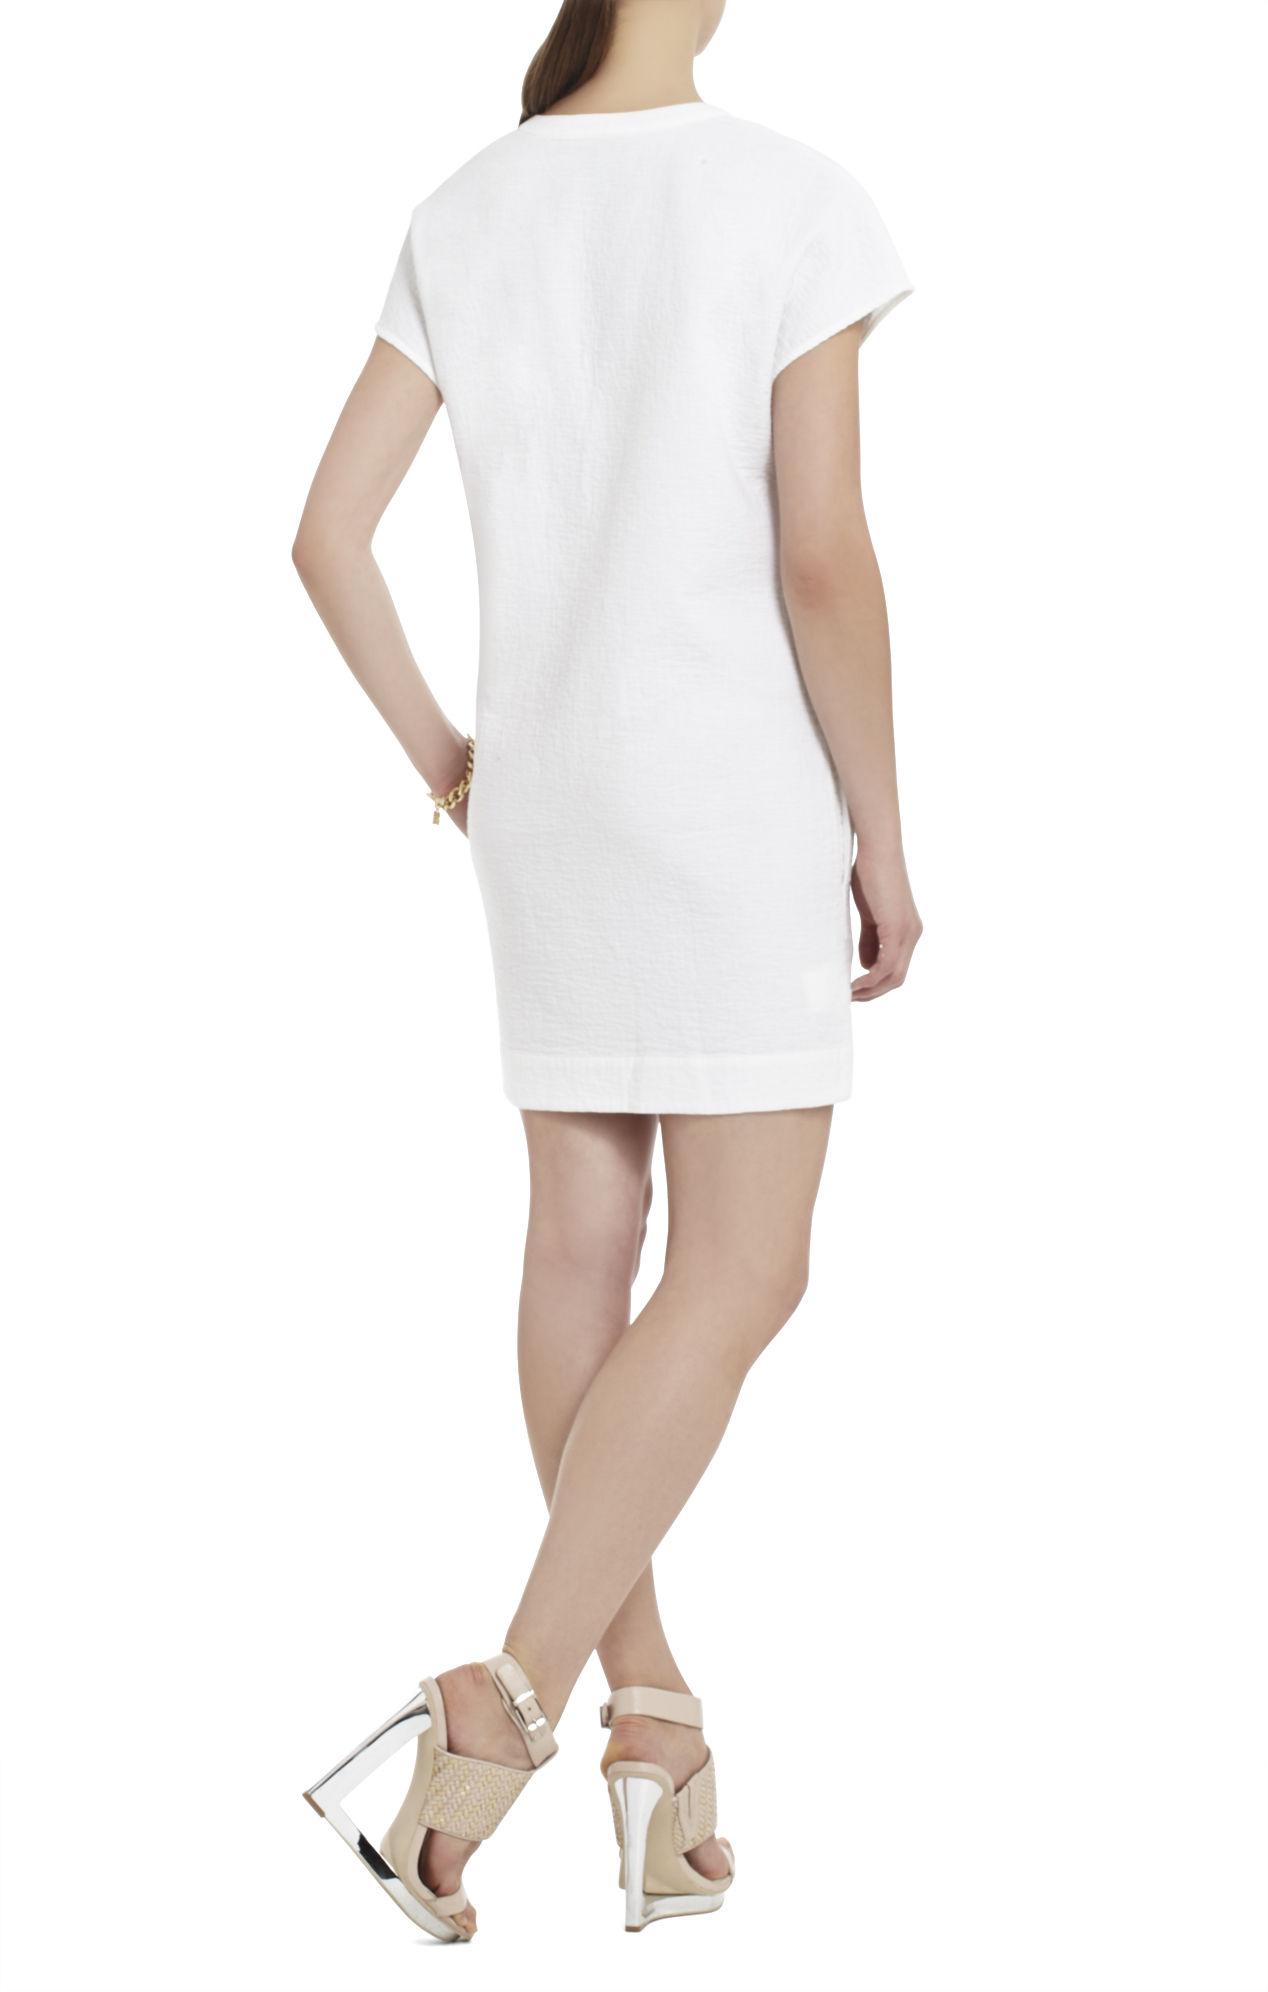 ed8cd449704 bcbg-white-carissa-sheath-dress-product-1-18552704-1-128343689-normal.jpeg